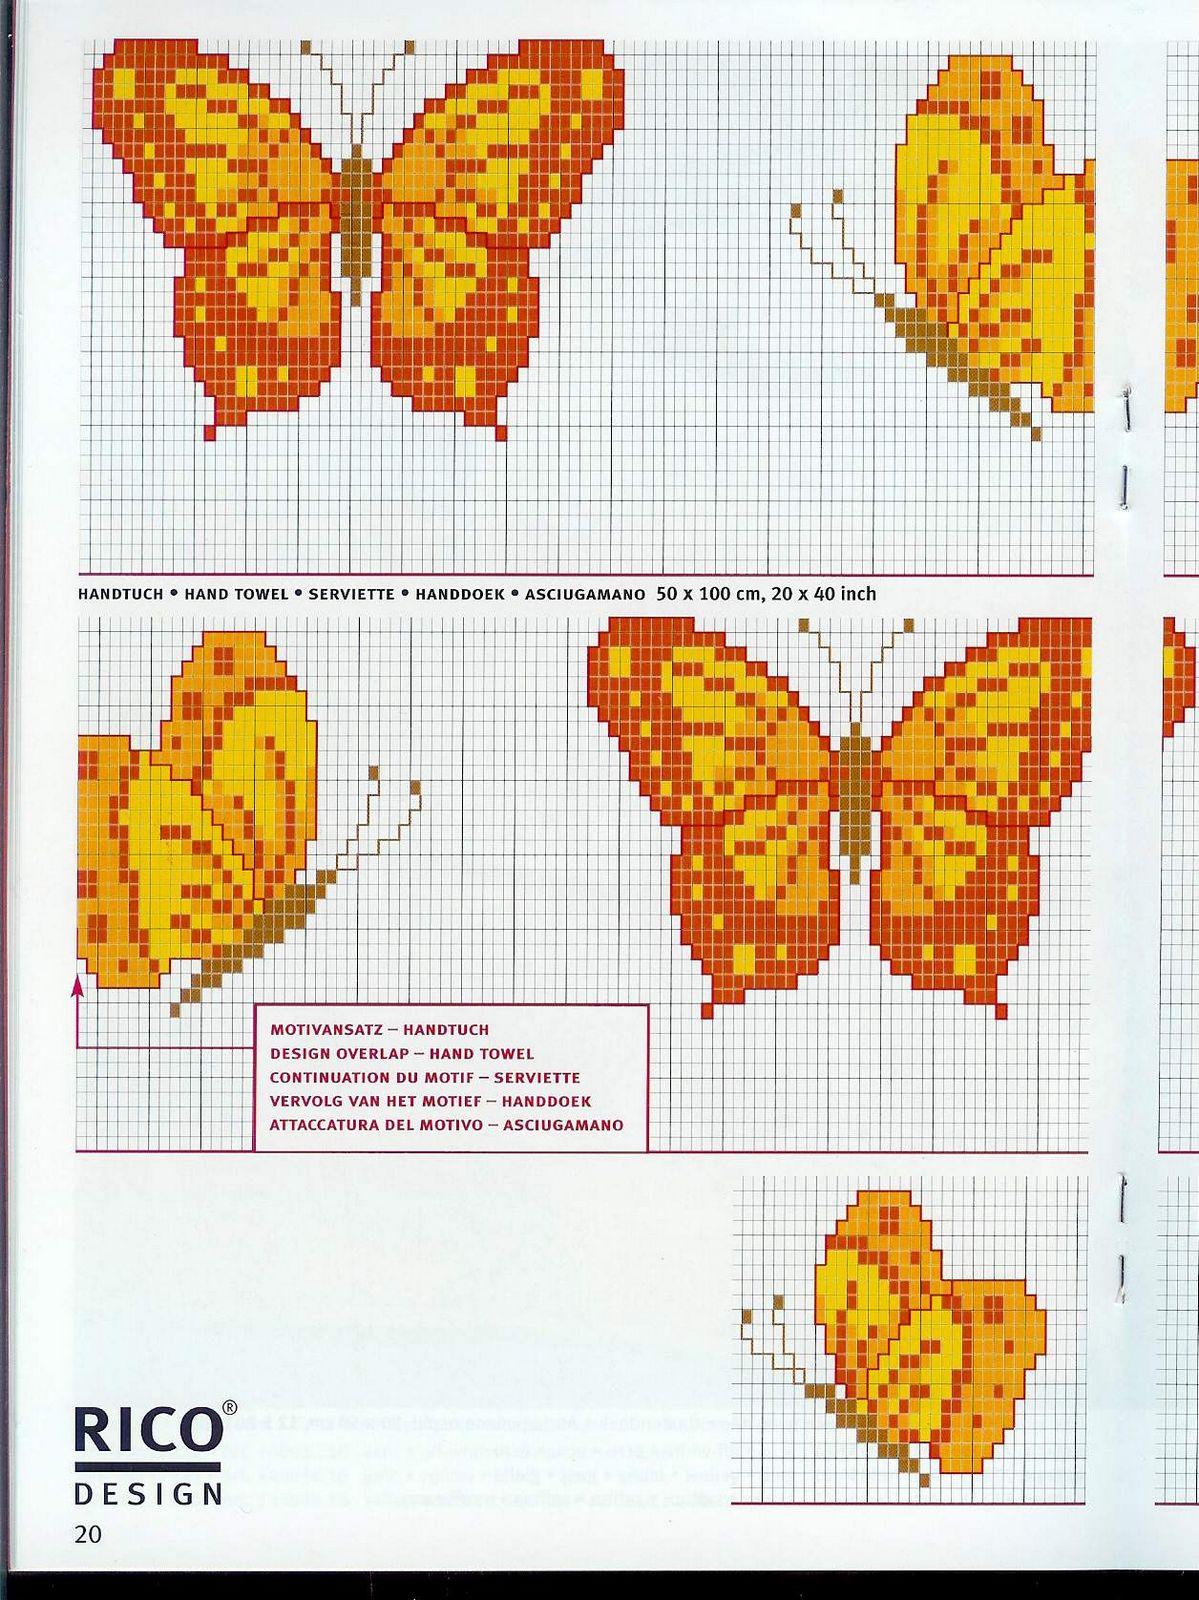 Farfalle punto croce schemi gratis for Farfalle punto croce schemi